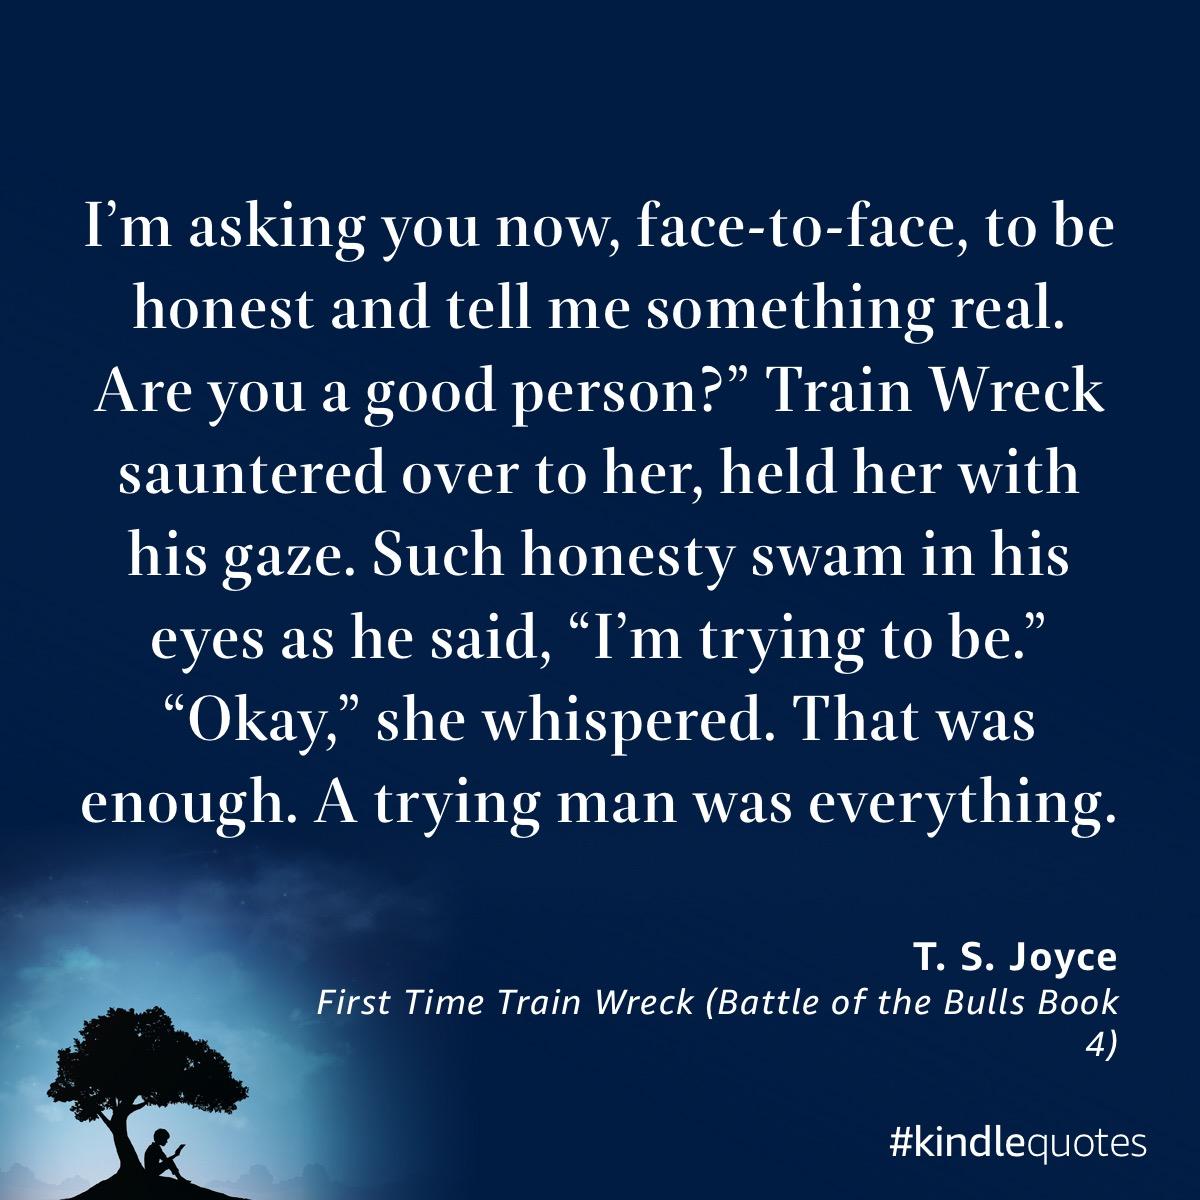 Book quote TS Joyce